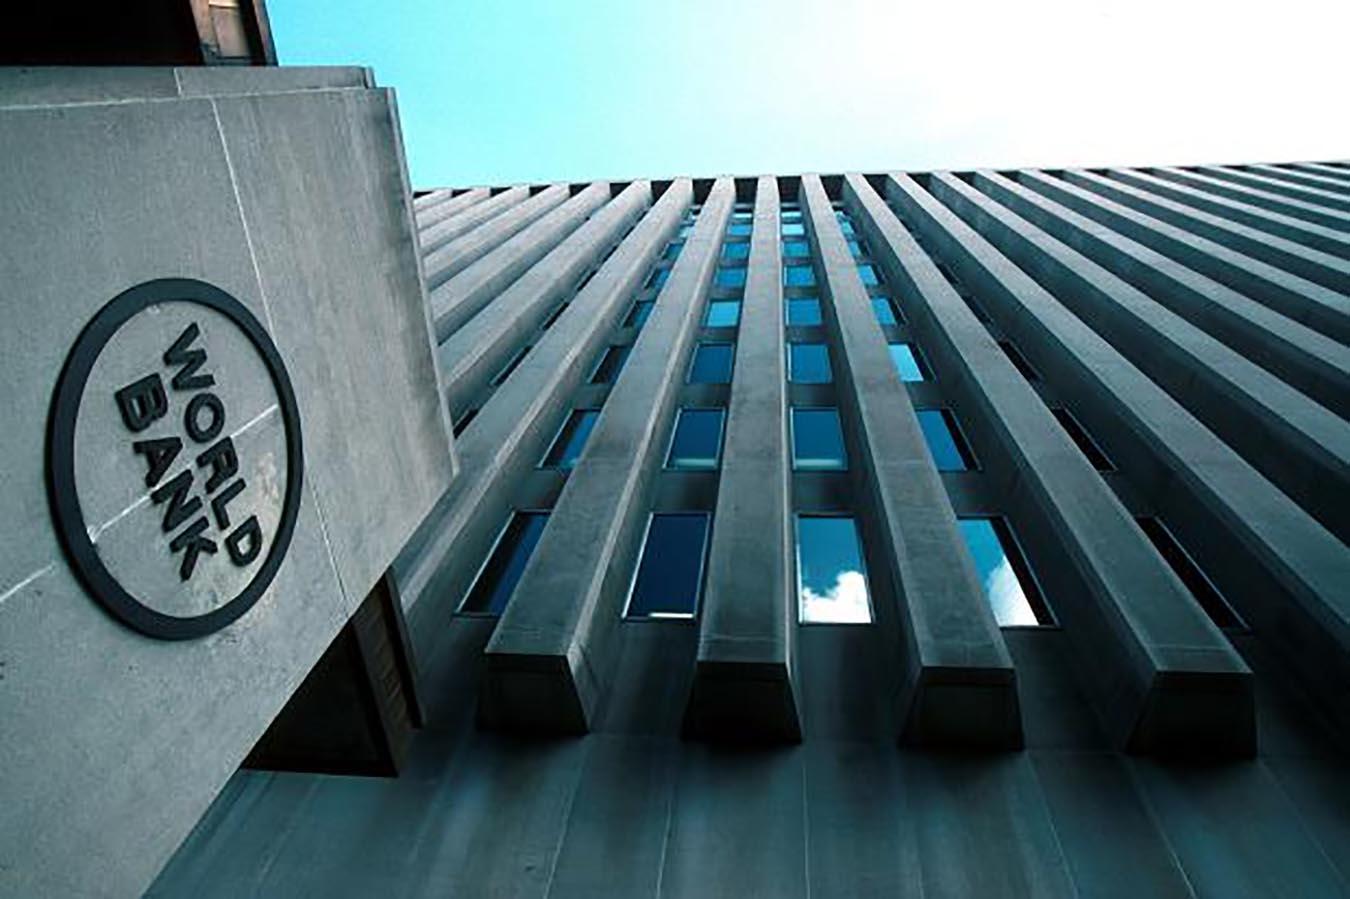 dunya-bankasindan-endonezyaya-300-milyon-dolarlik-kredi